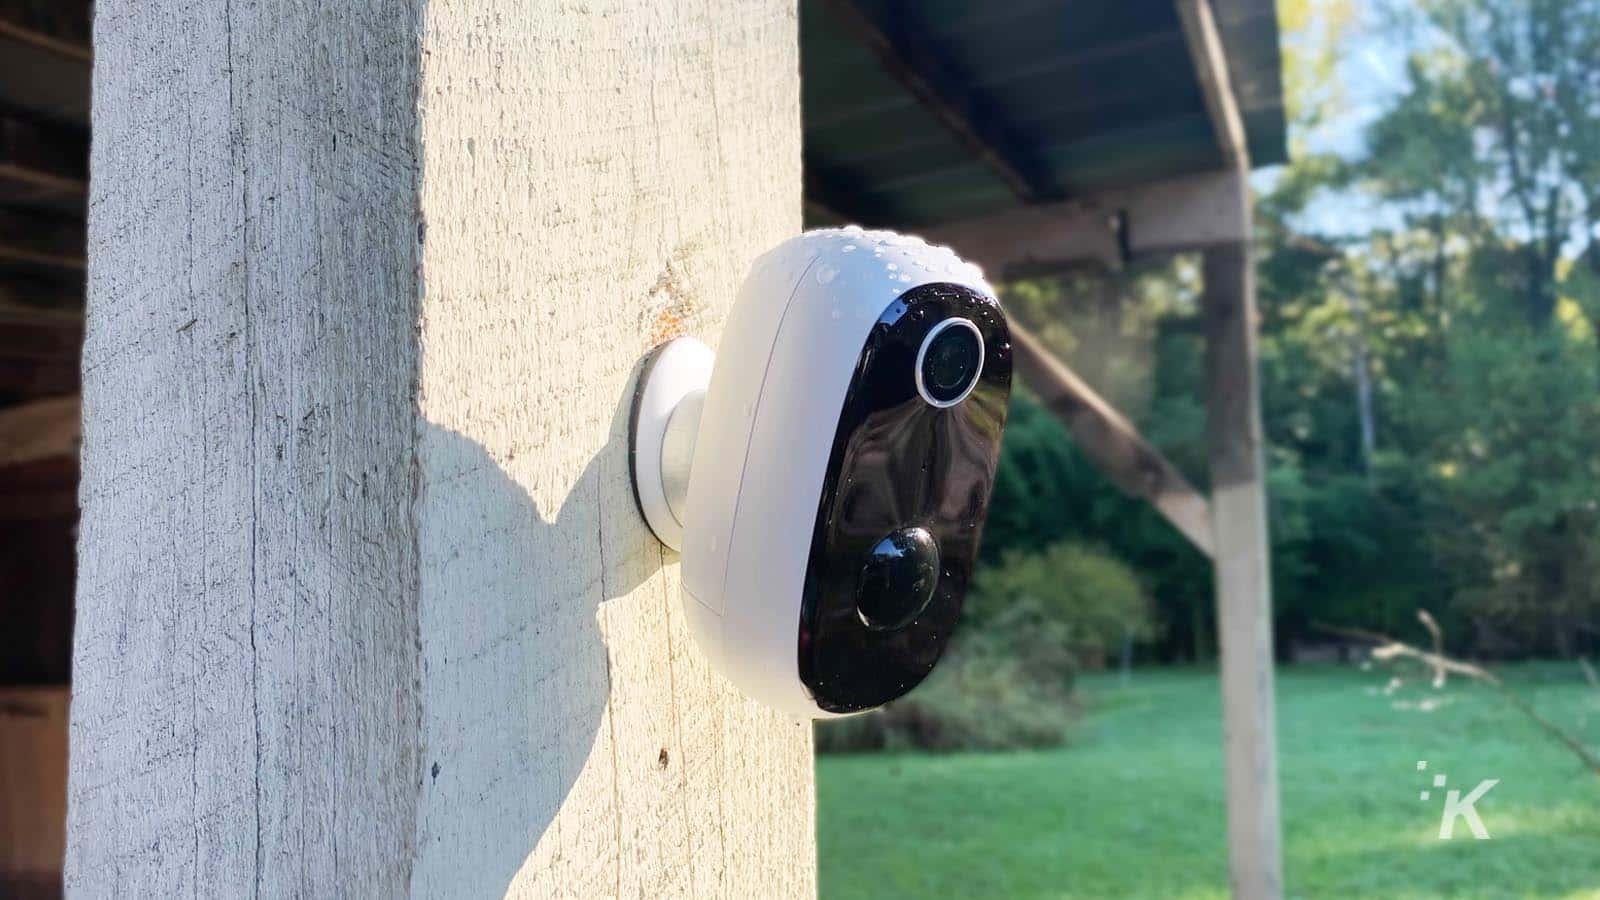 meco security camera